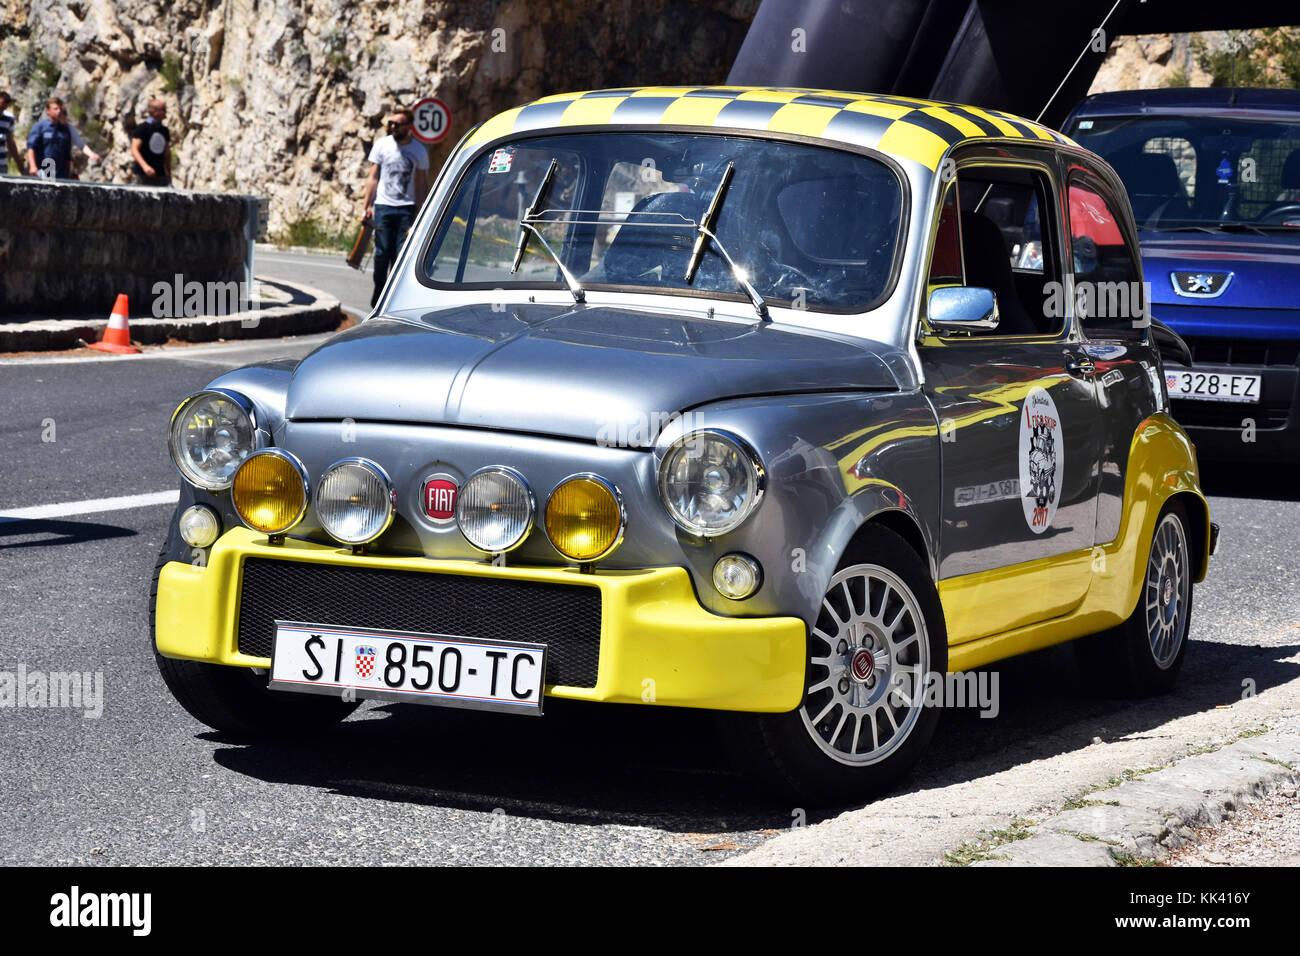 Fiat Abarth 850tc m completamente restaurado, durante la colina raza skradin, CROACIA Imagen De Stock